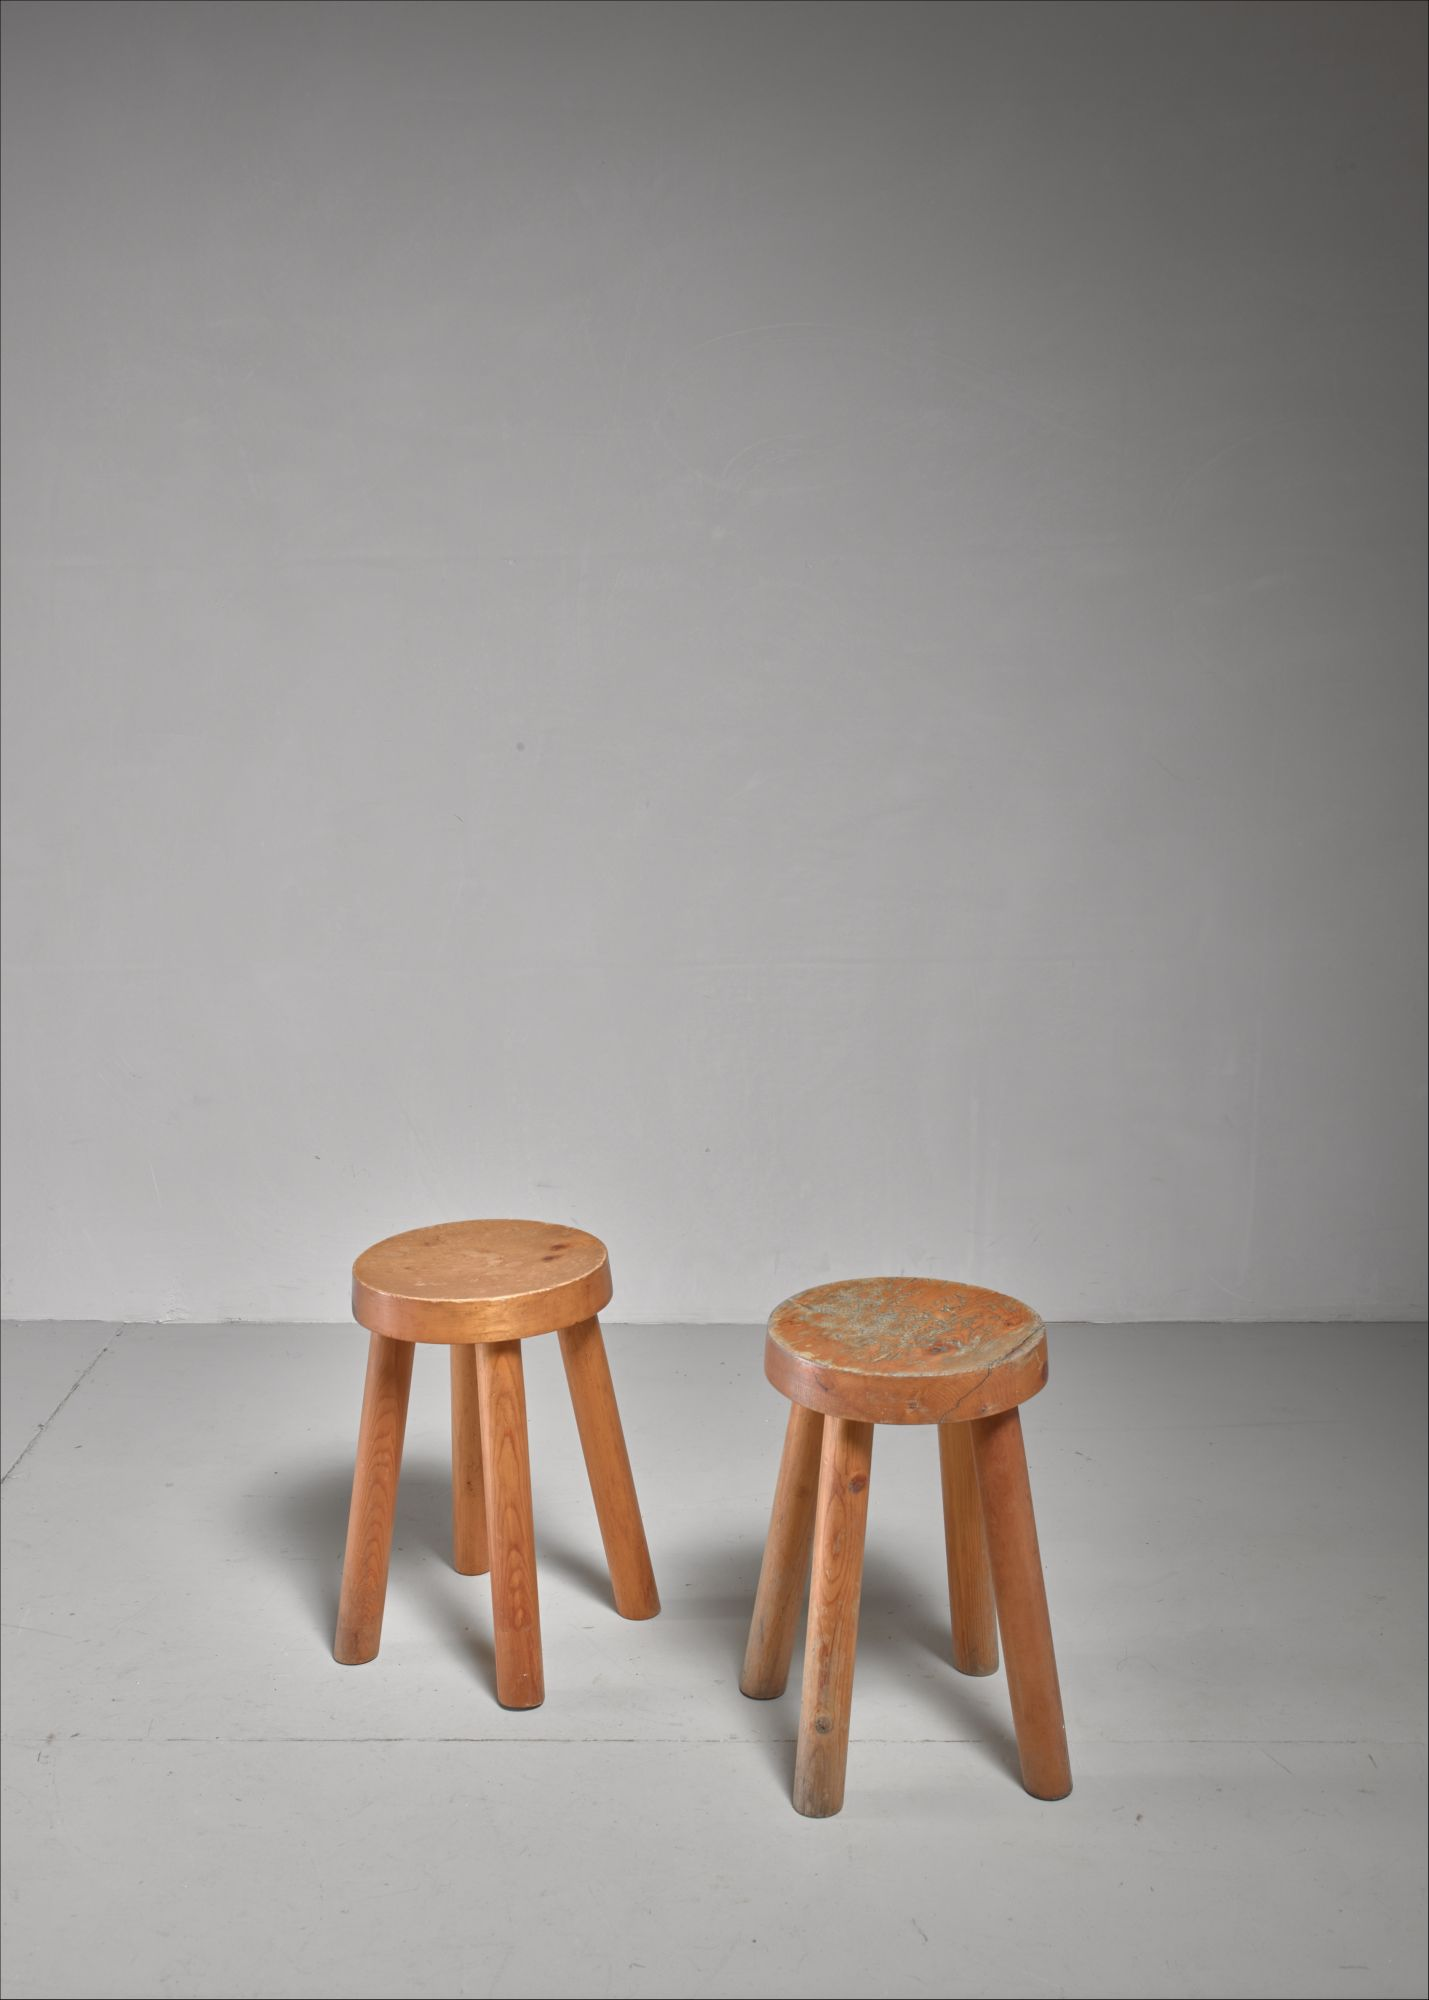 Phenomenal Charlotte Perriand Pair Of Four Legged Pine Stools France Ibusinesslaw Wood Chair Design Ideas Ibusinesslaworg